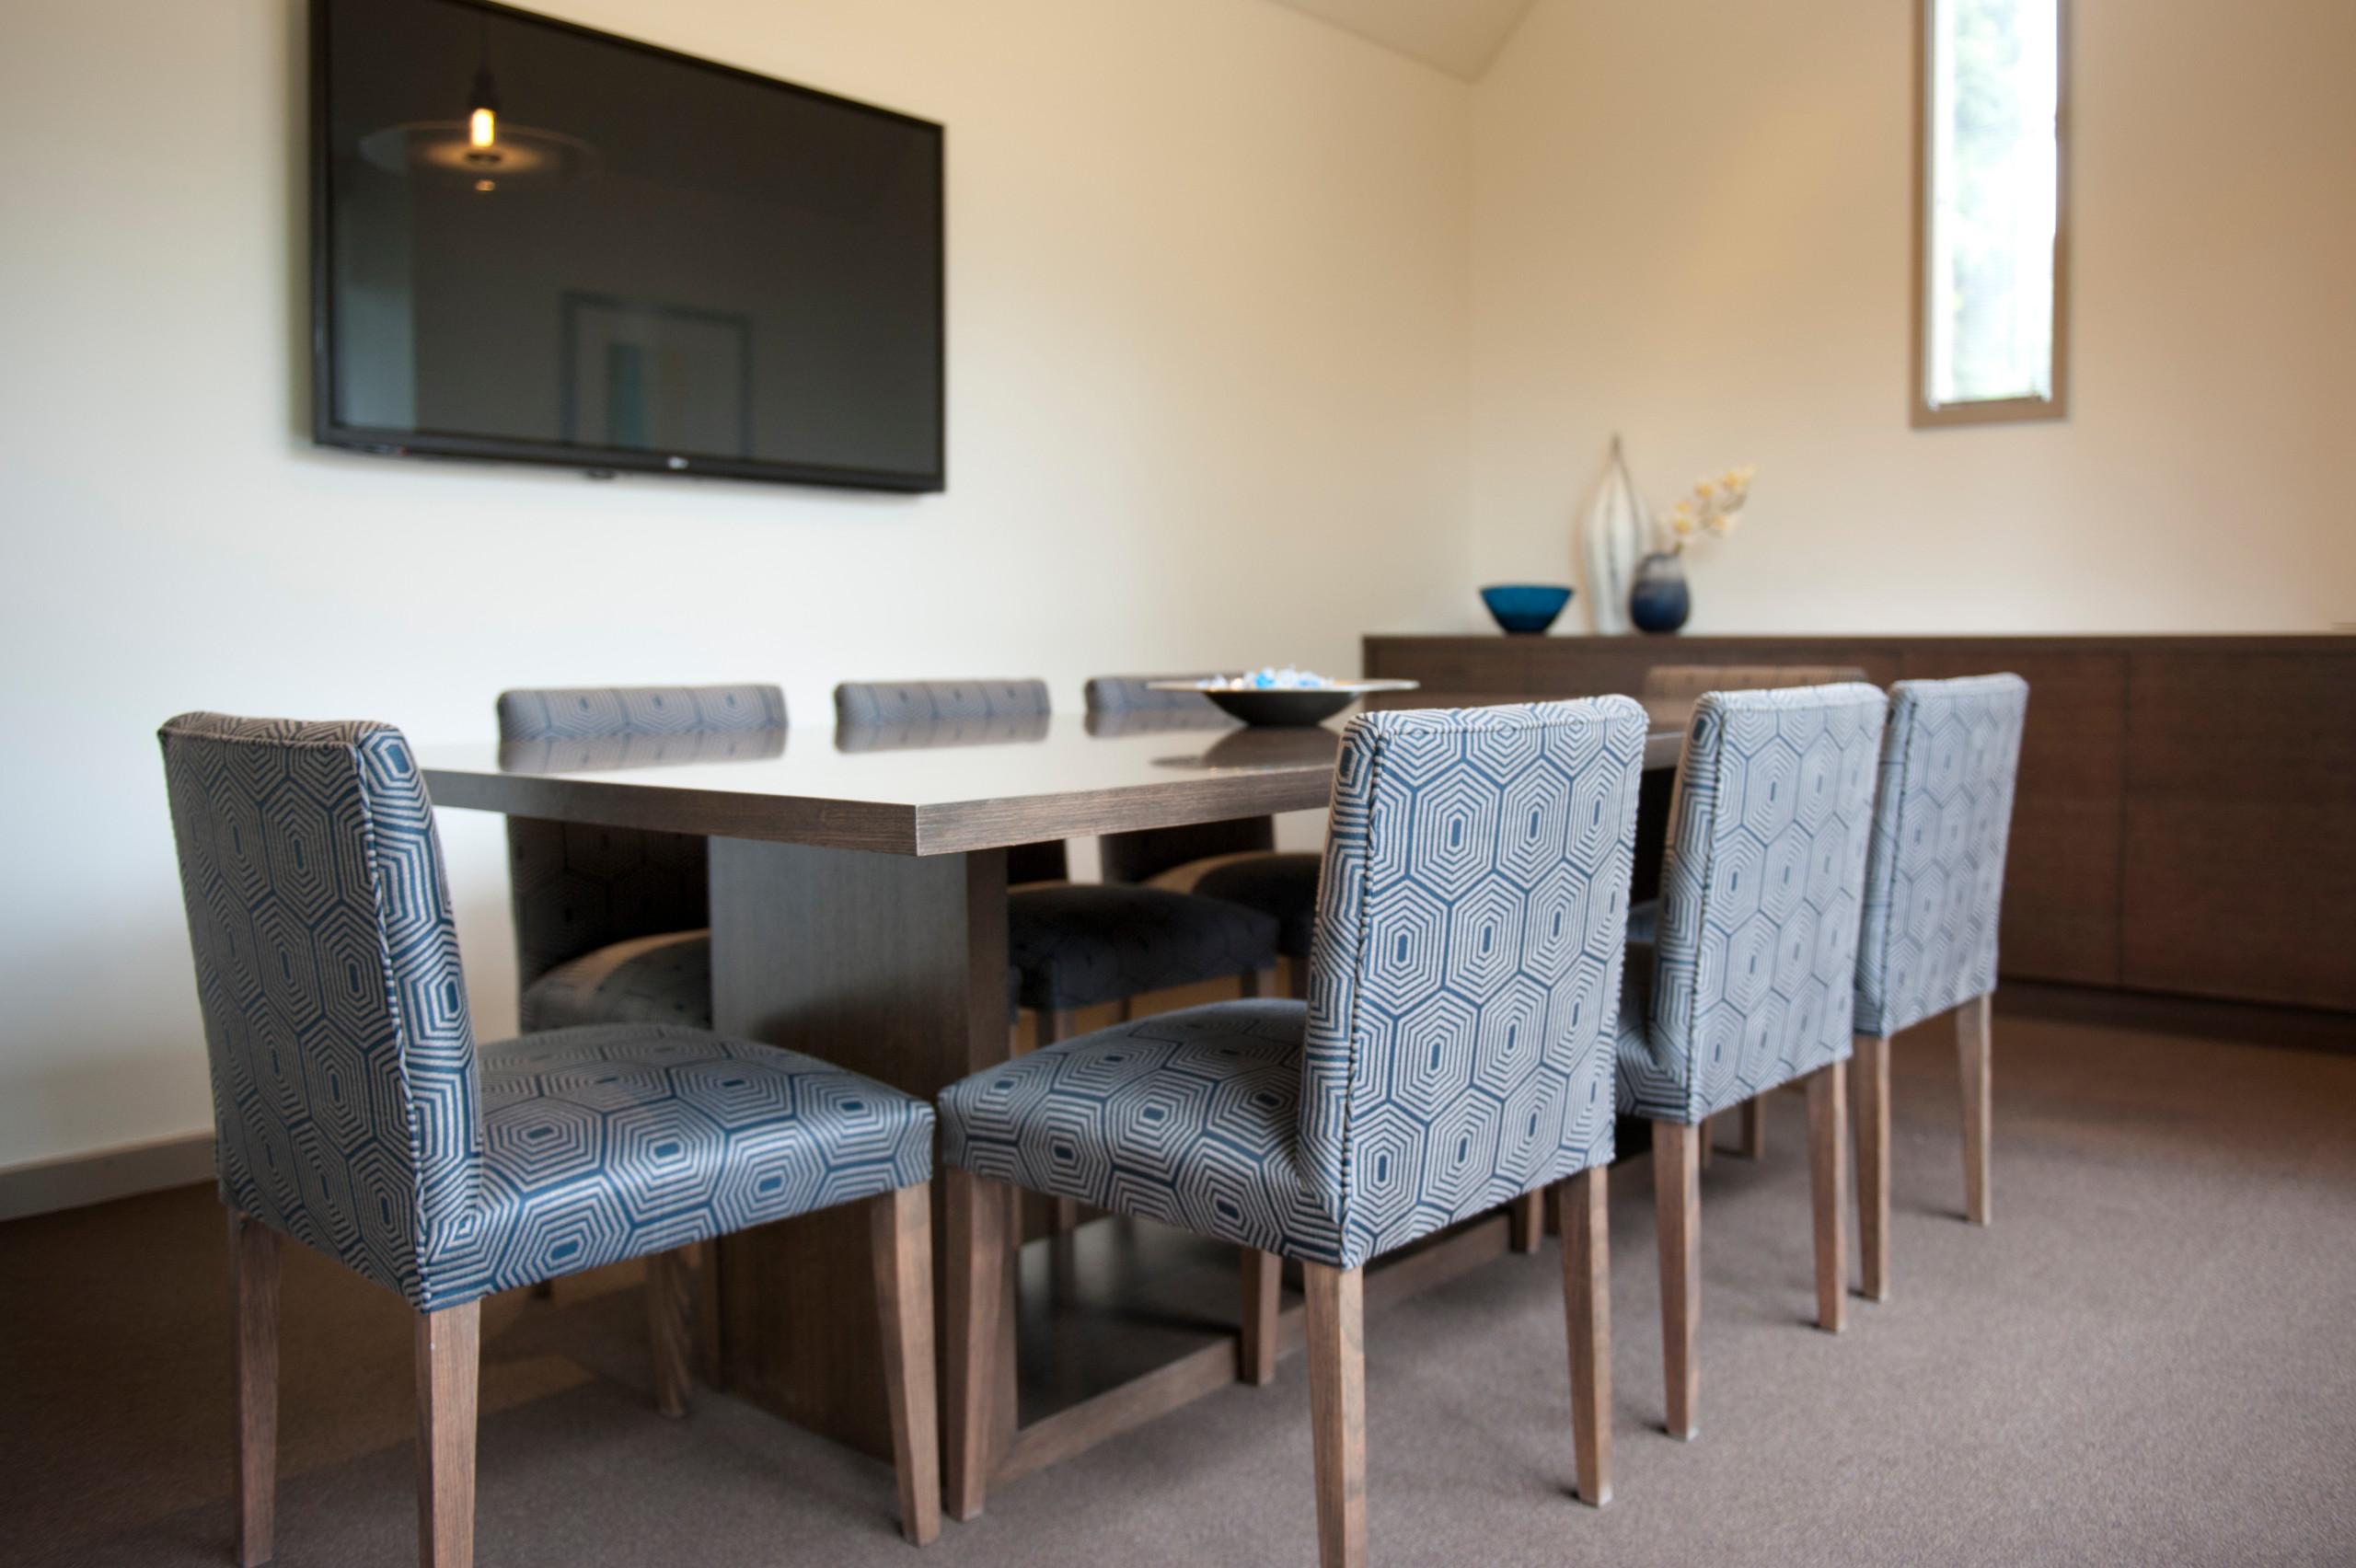 Eltham, Boardroom and Reception